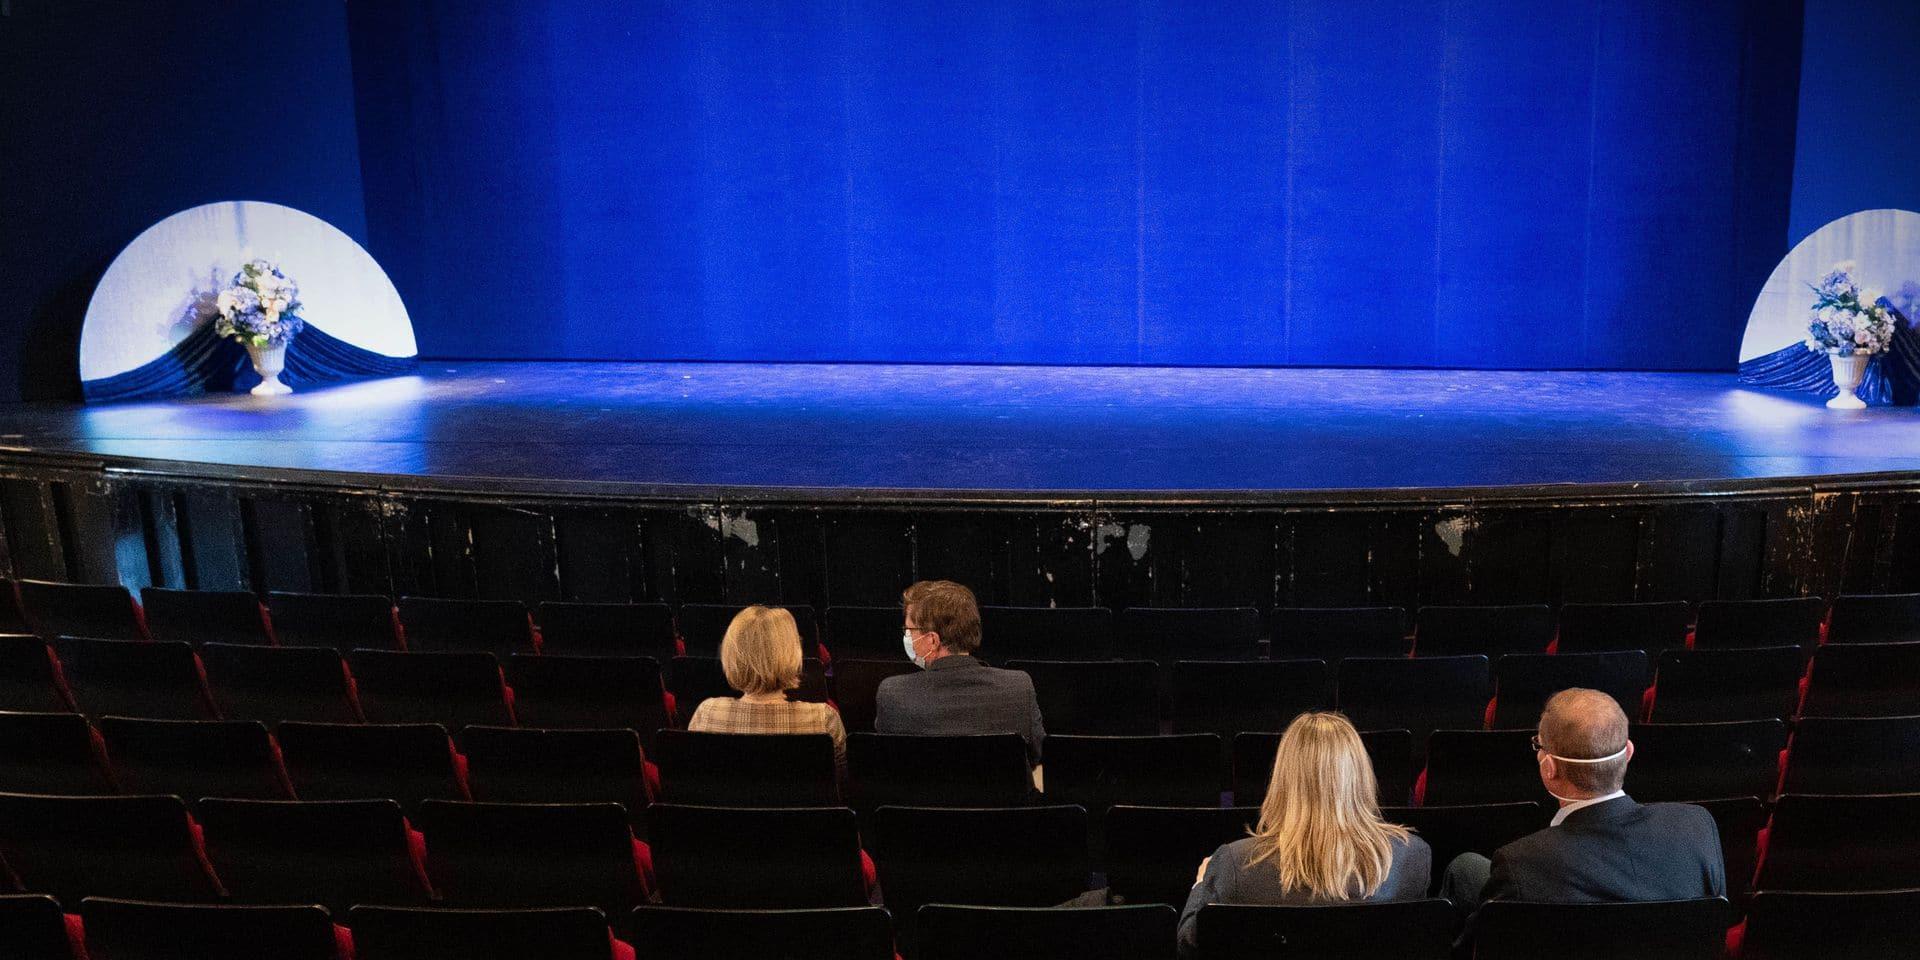 Start of the model project Culture of the Kiel Theatre